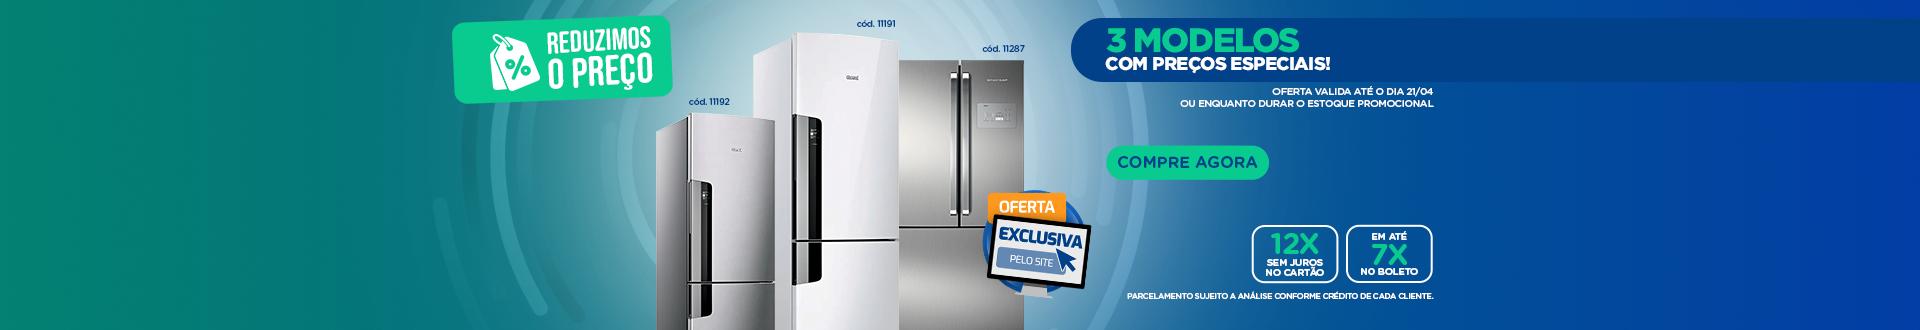 Oferta Especial Refrigeradores